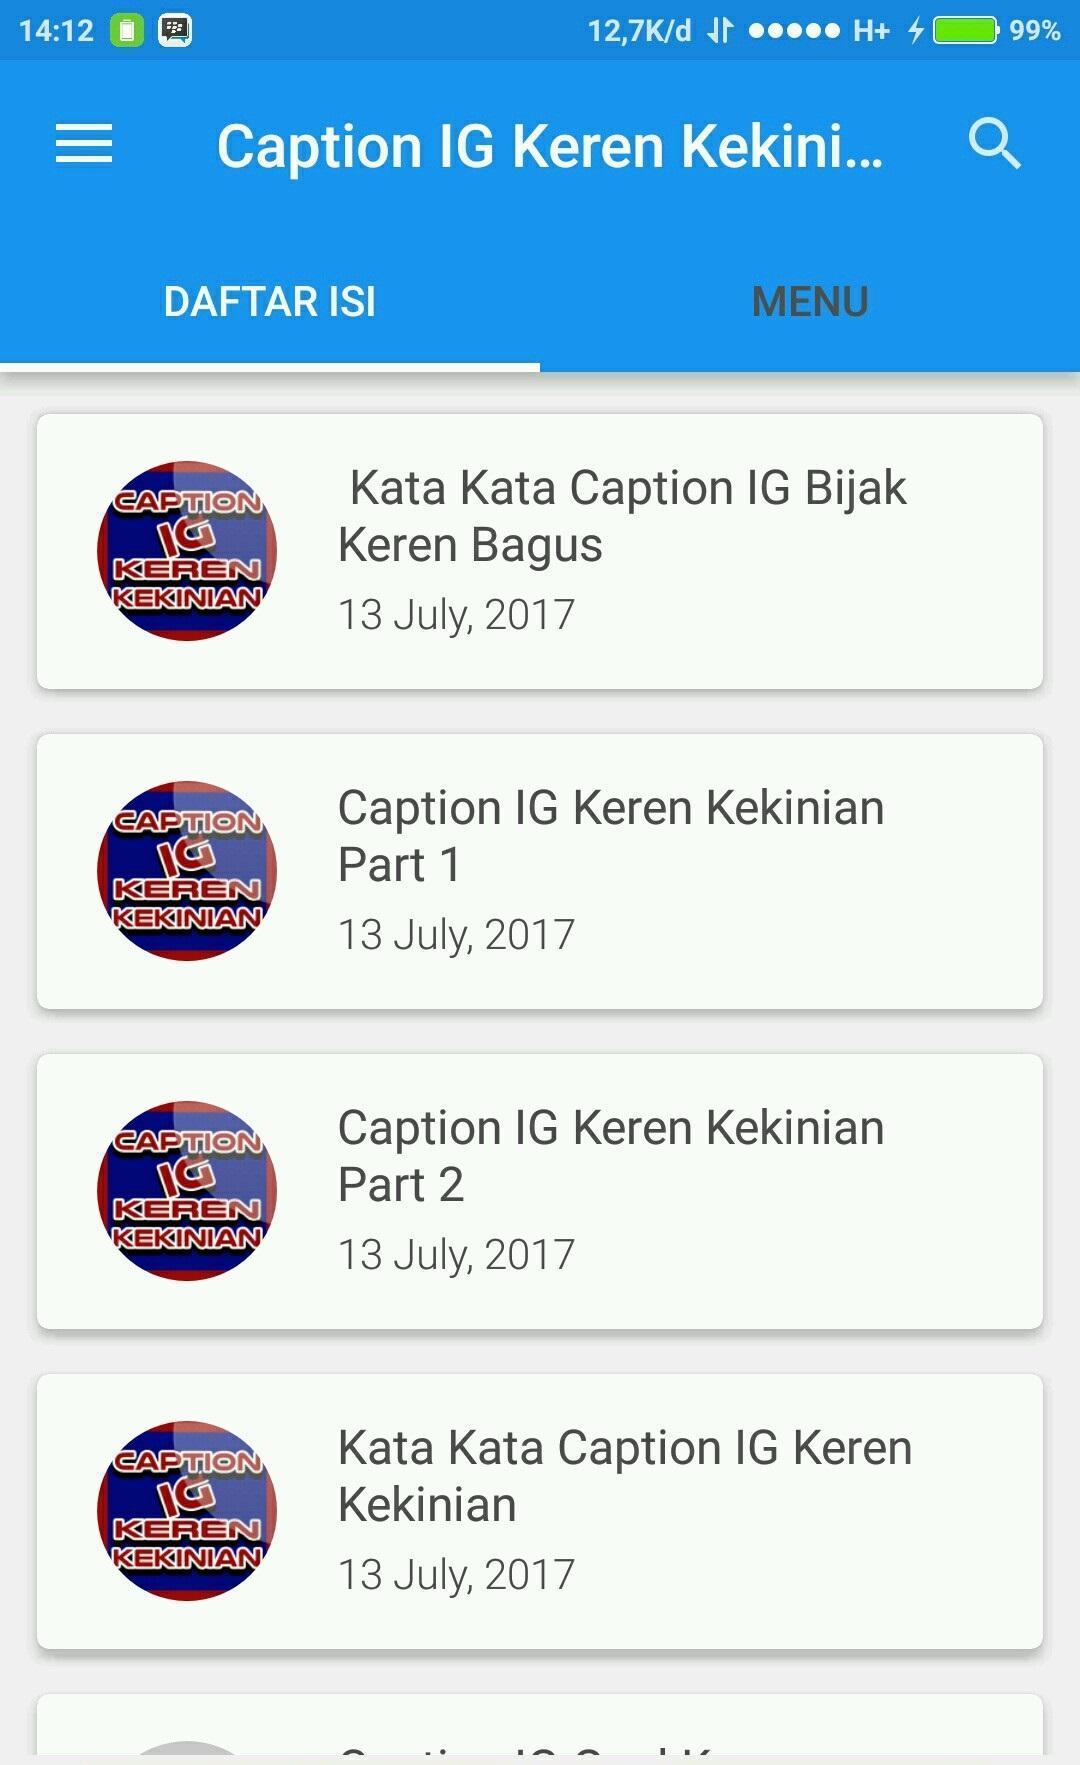 Caption Ig Keren Kekinian Hits For Android Apk Download